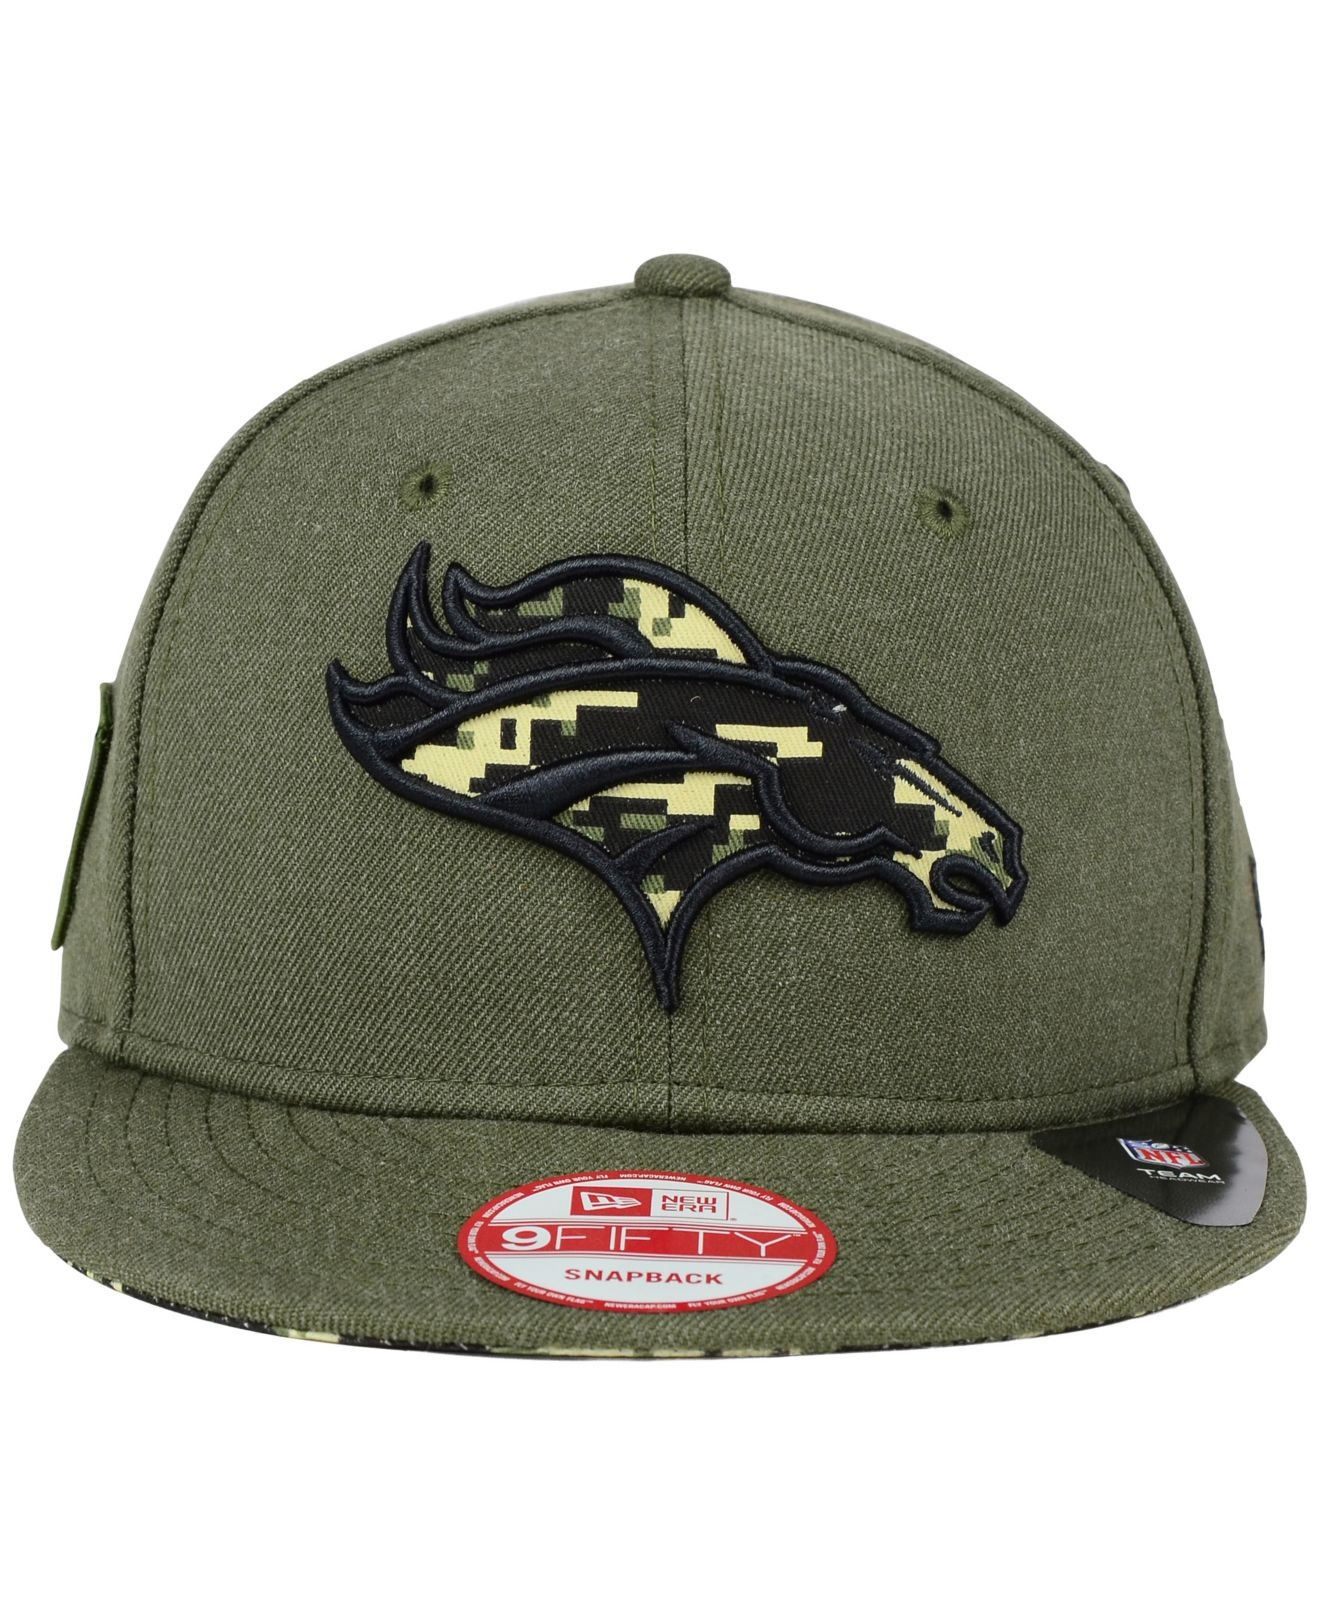 Lyst - KTZ Denver Broncos Camo 9fifty Snapback Cap in Green for Men 7ba317d46558